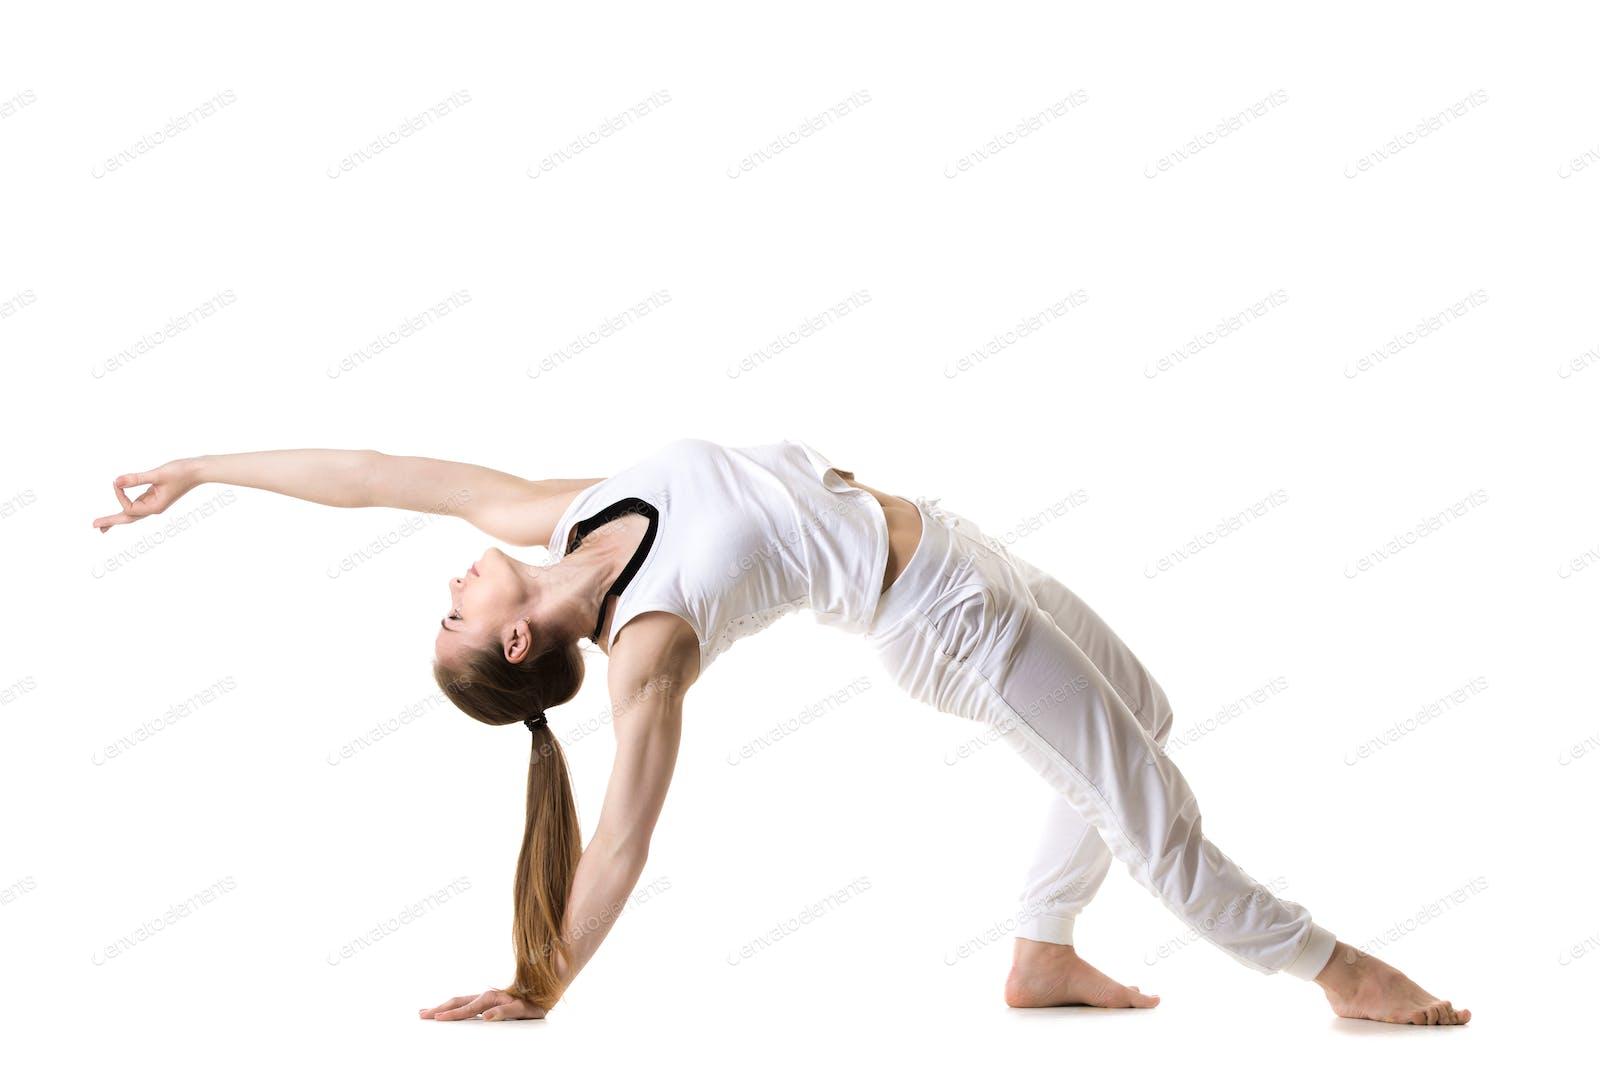 Wild Thing yoga pose photo by fizkes on Envato Elements